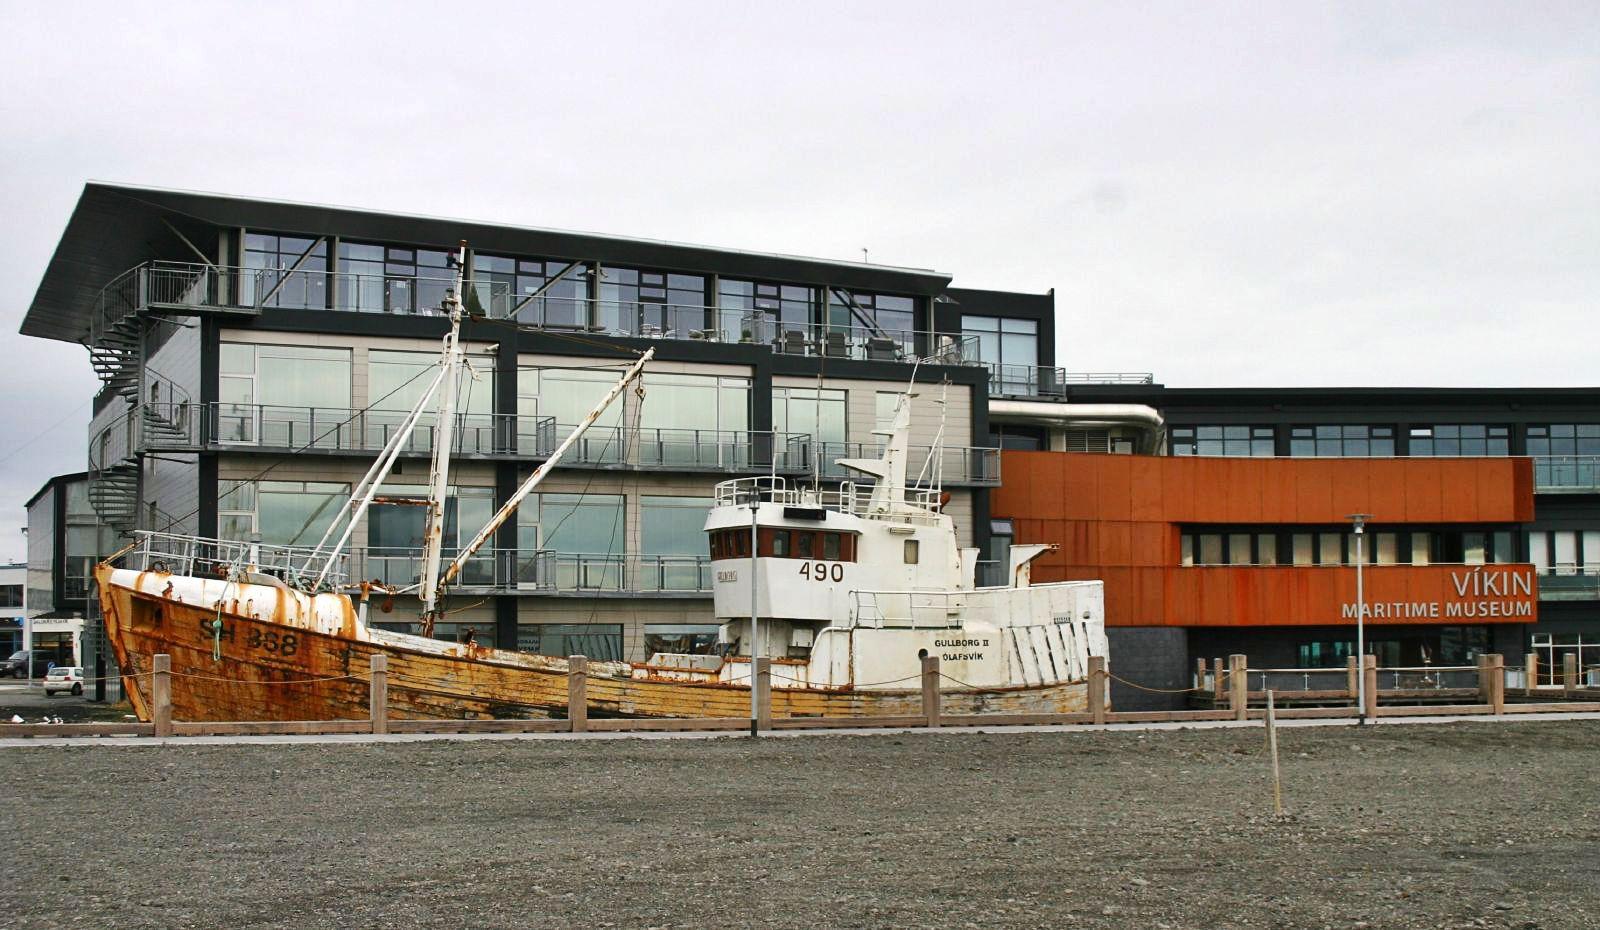 Reykjavík Maritime Museum - Wikipedia